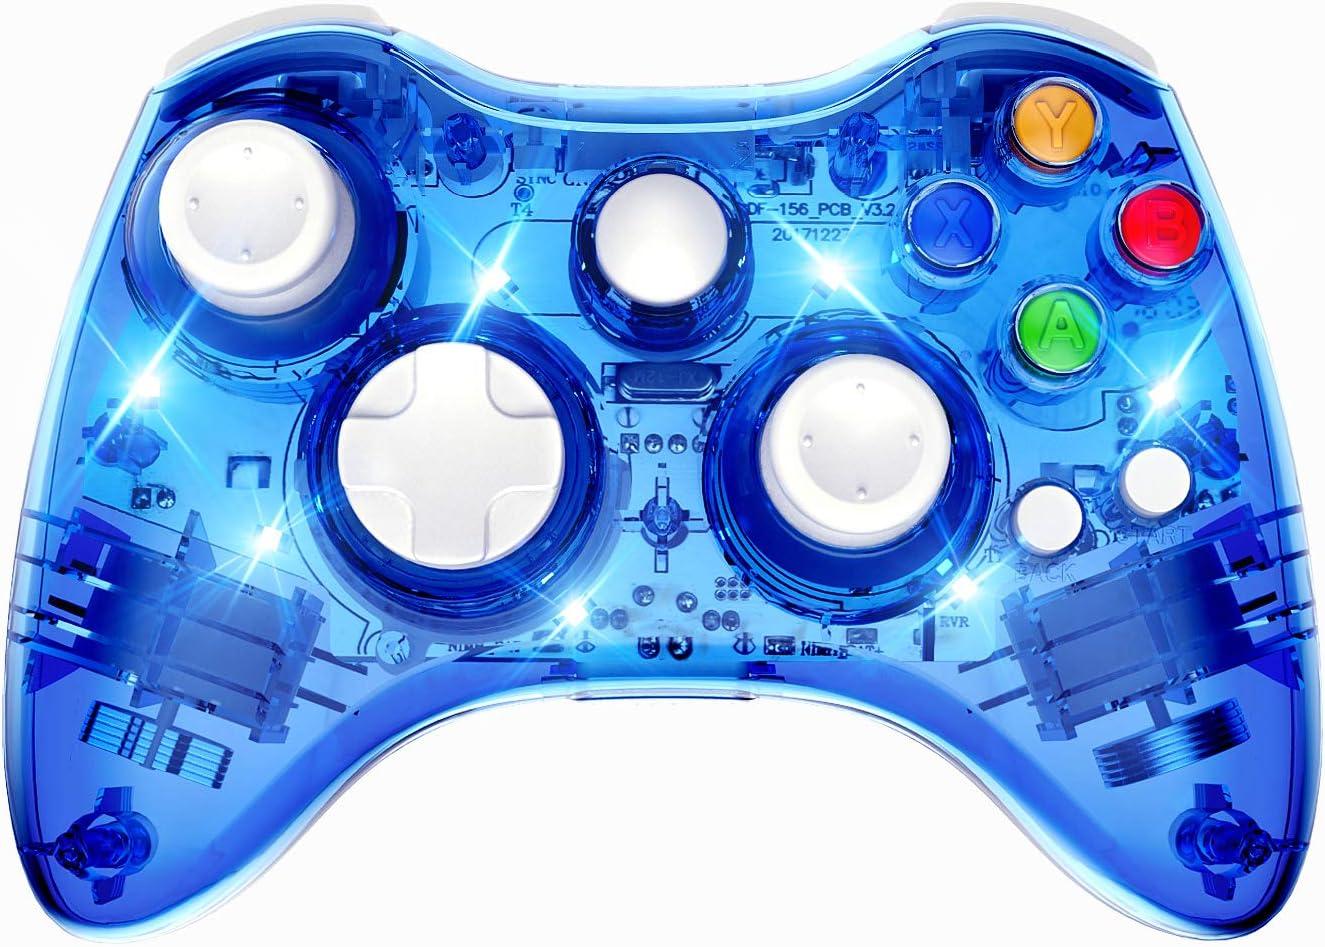 PAWHITS Wireless Xbox 360 Controller Double Motor Vibration Wireless Gamepad Gaming Joypad, Blue: Electronics